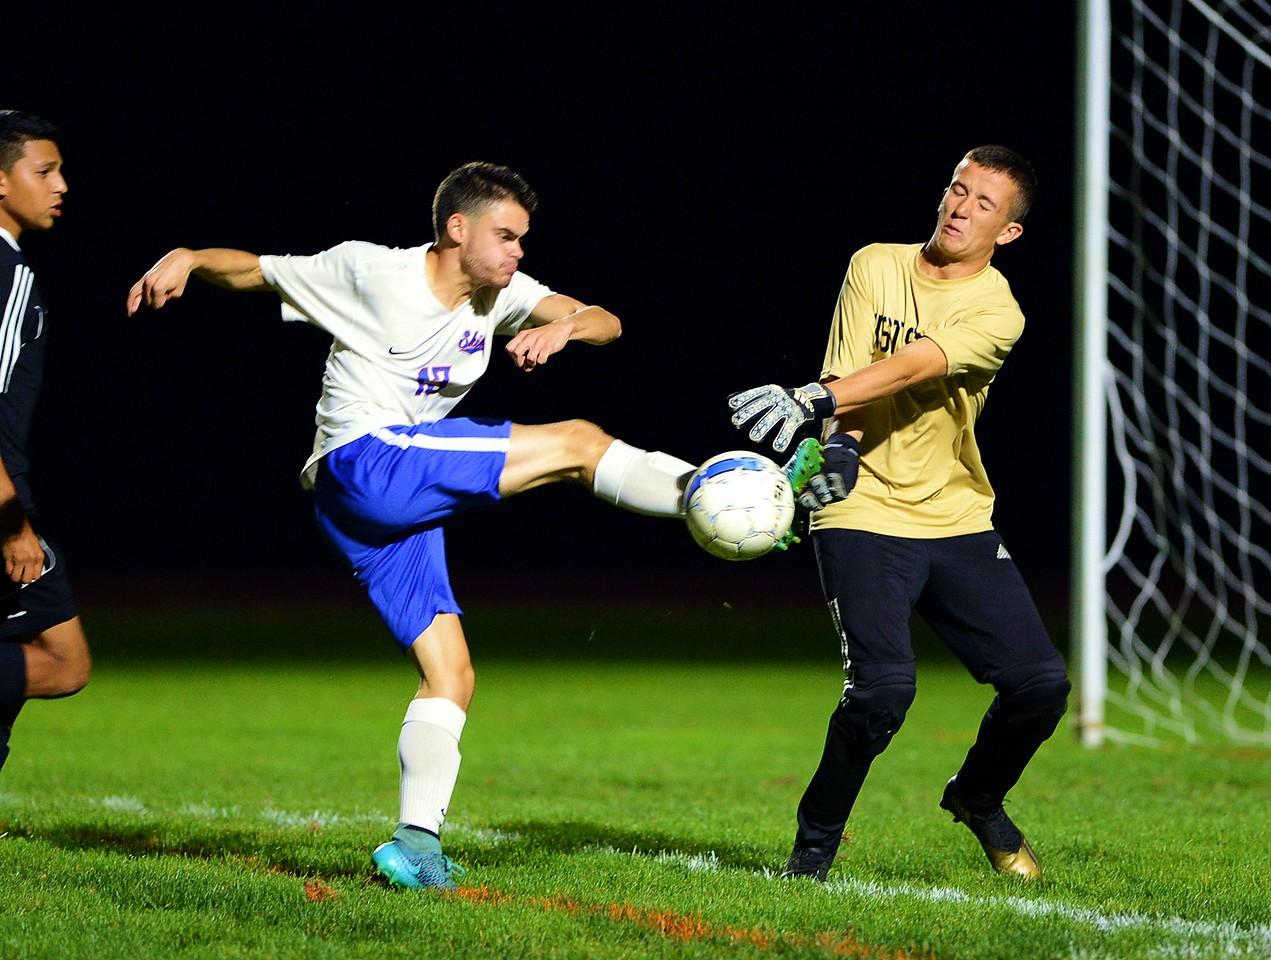 Neshaminy's Nick Lindsey (13, left) pressures Truman goalie Dawson Black.